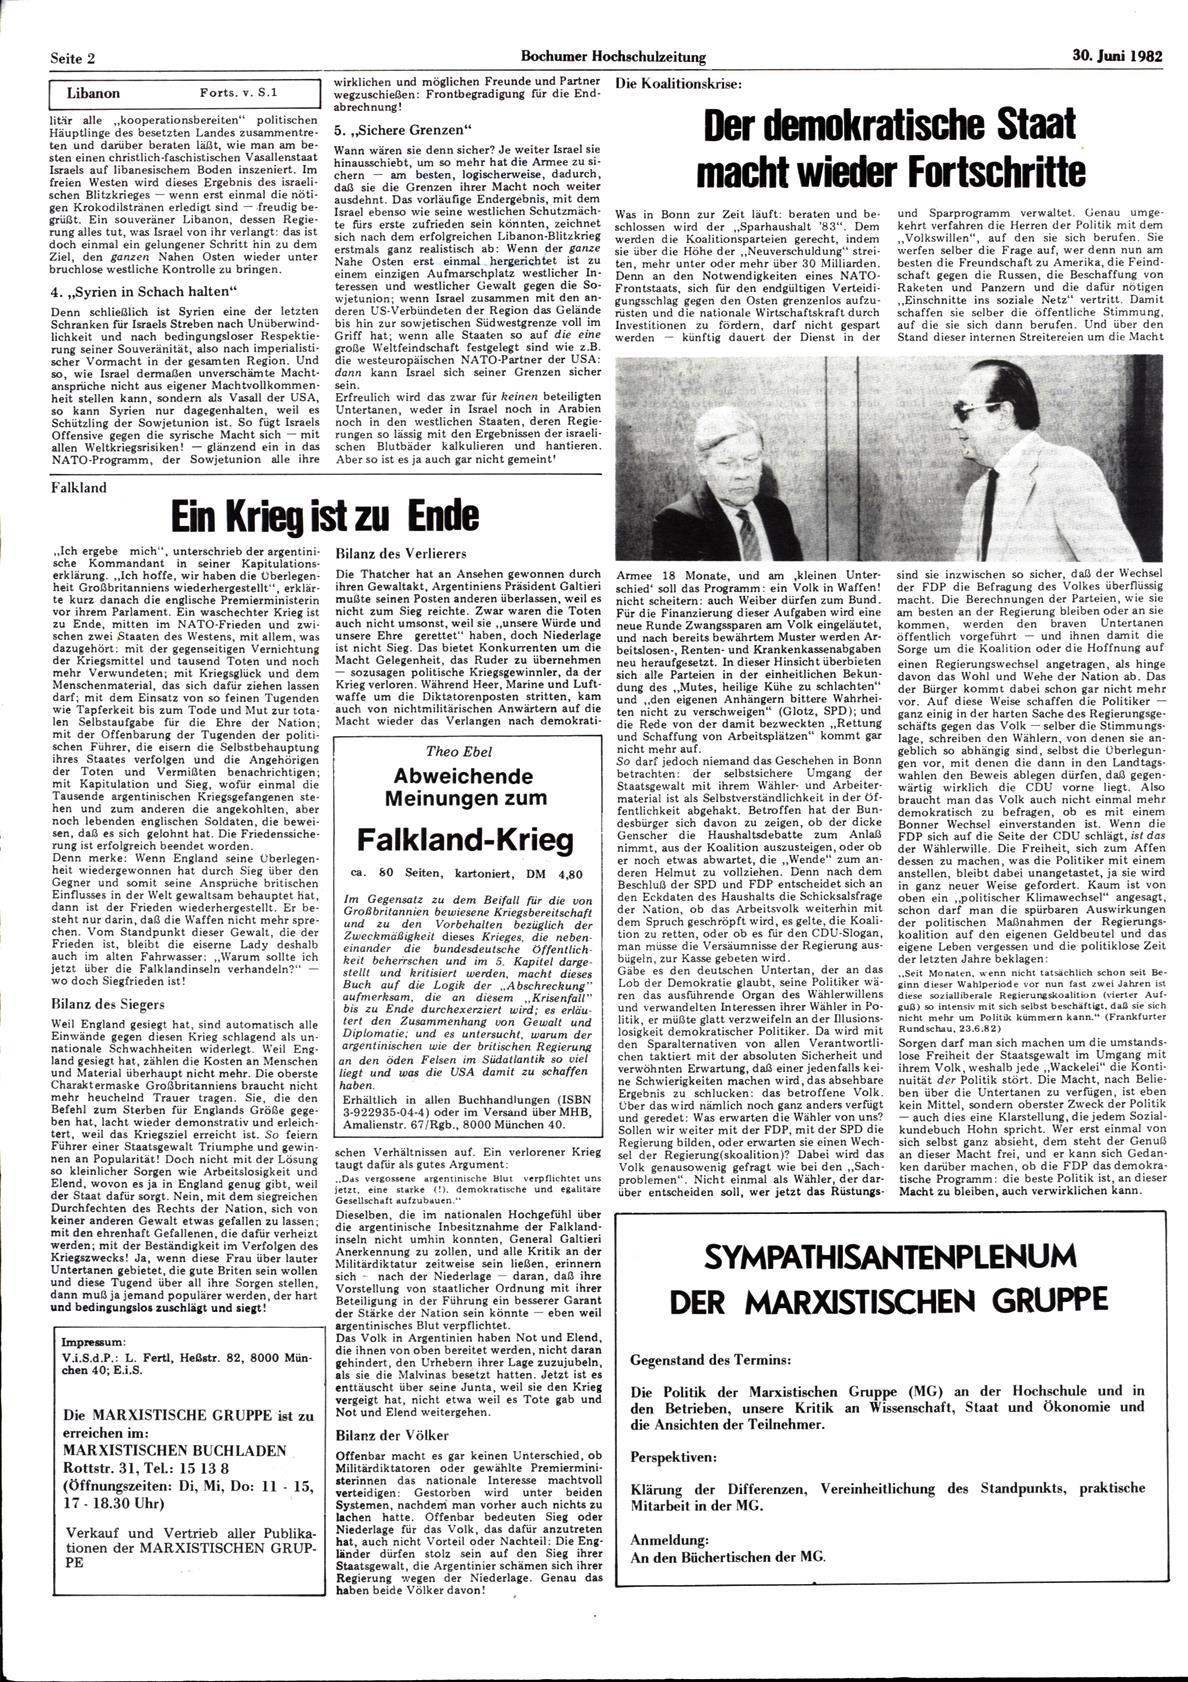 Bochum_BHZ_19820630_054_002